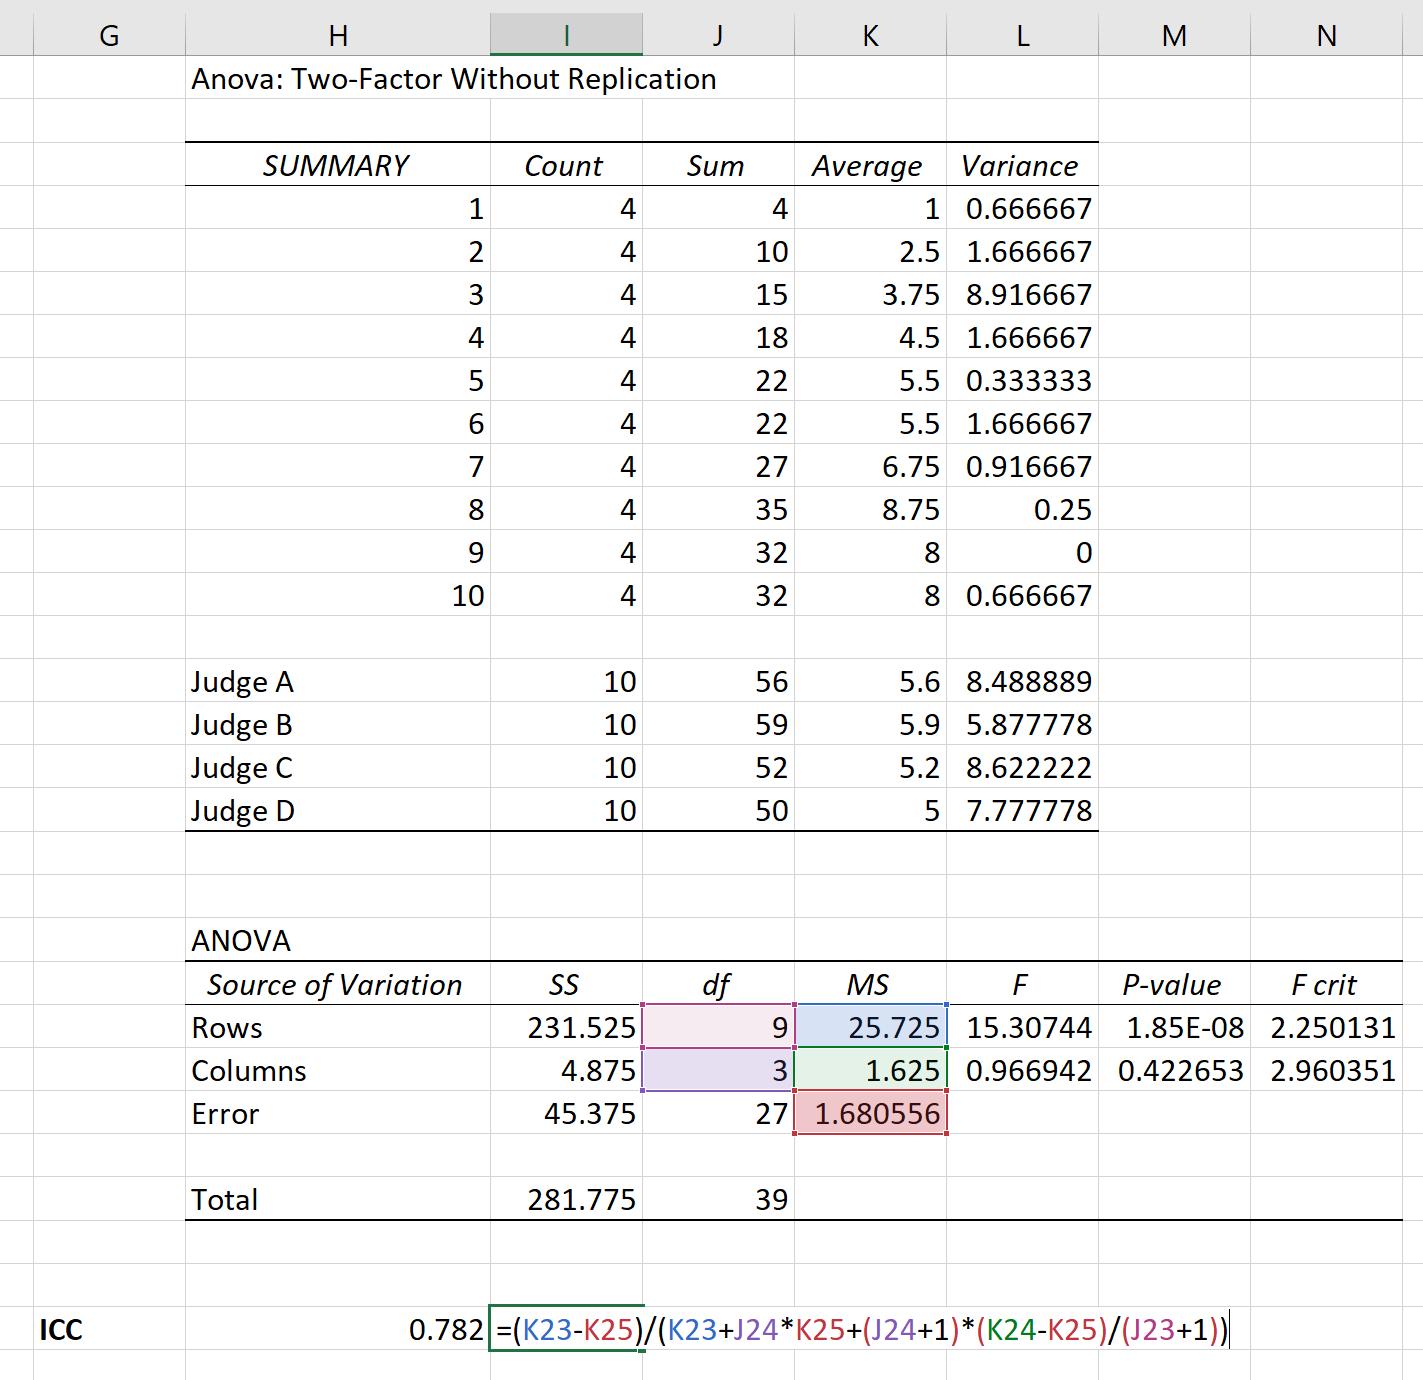 Intraclass correlation coefficient in Excel